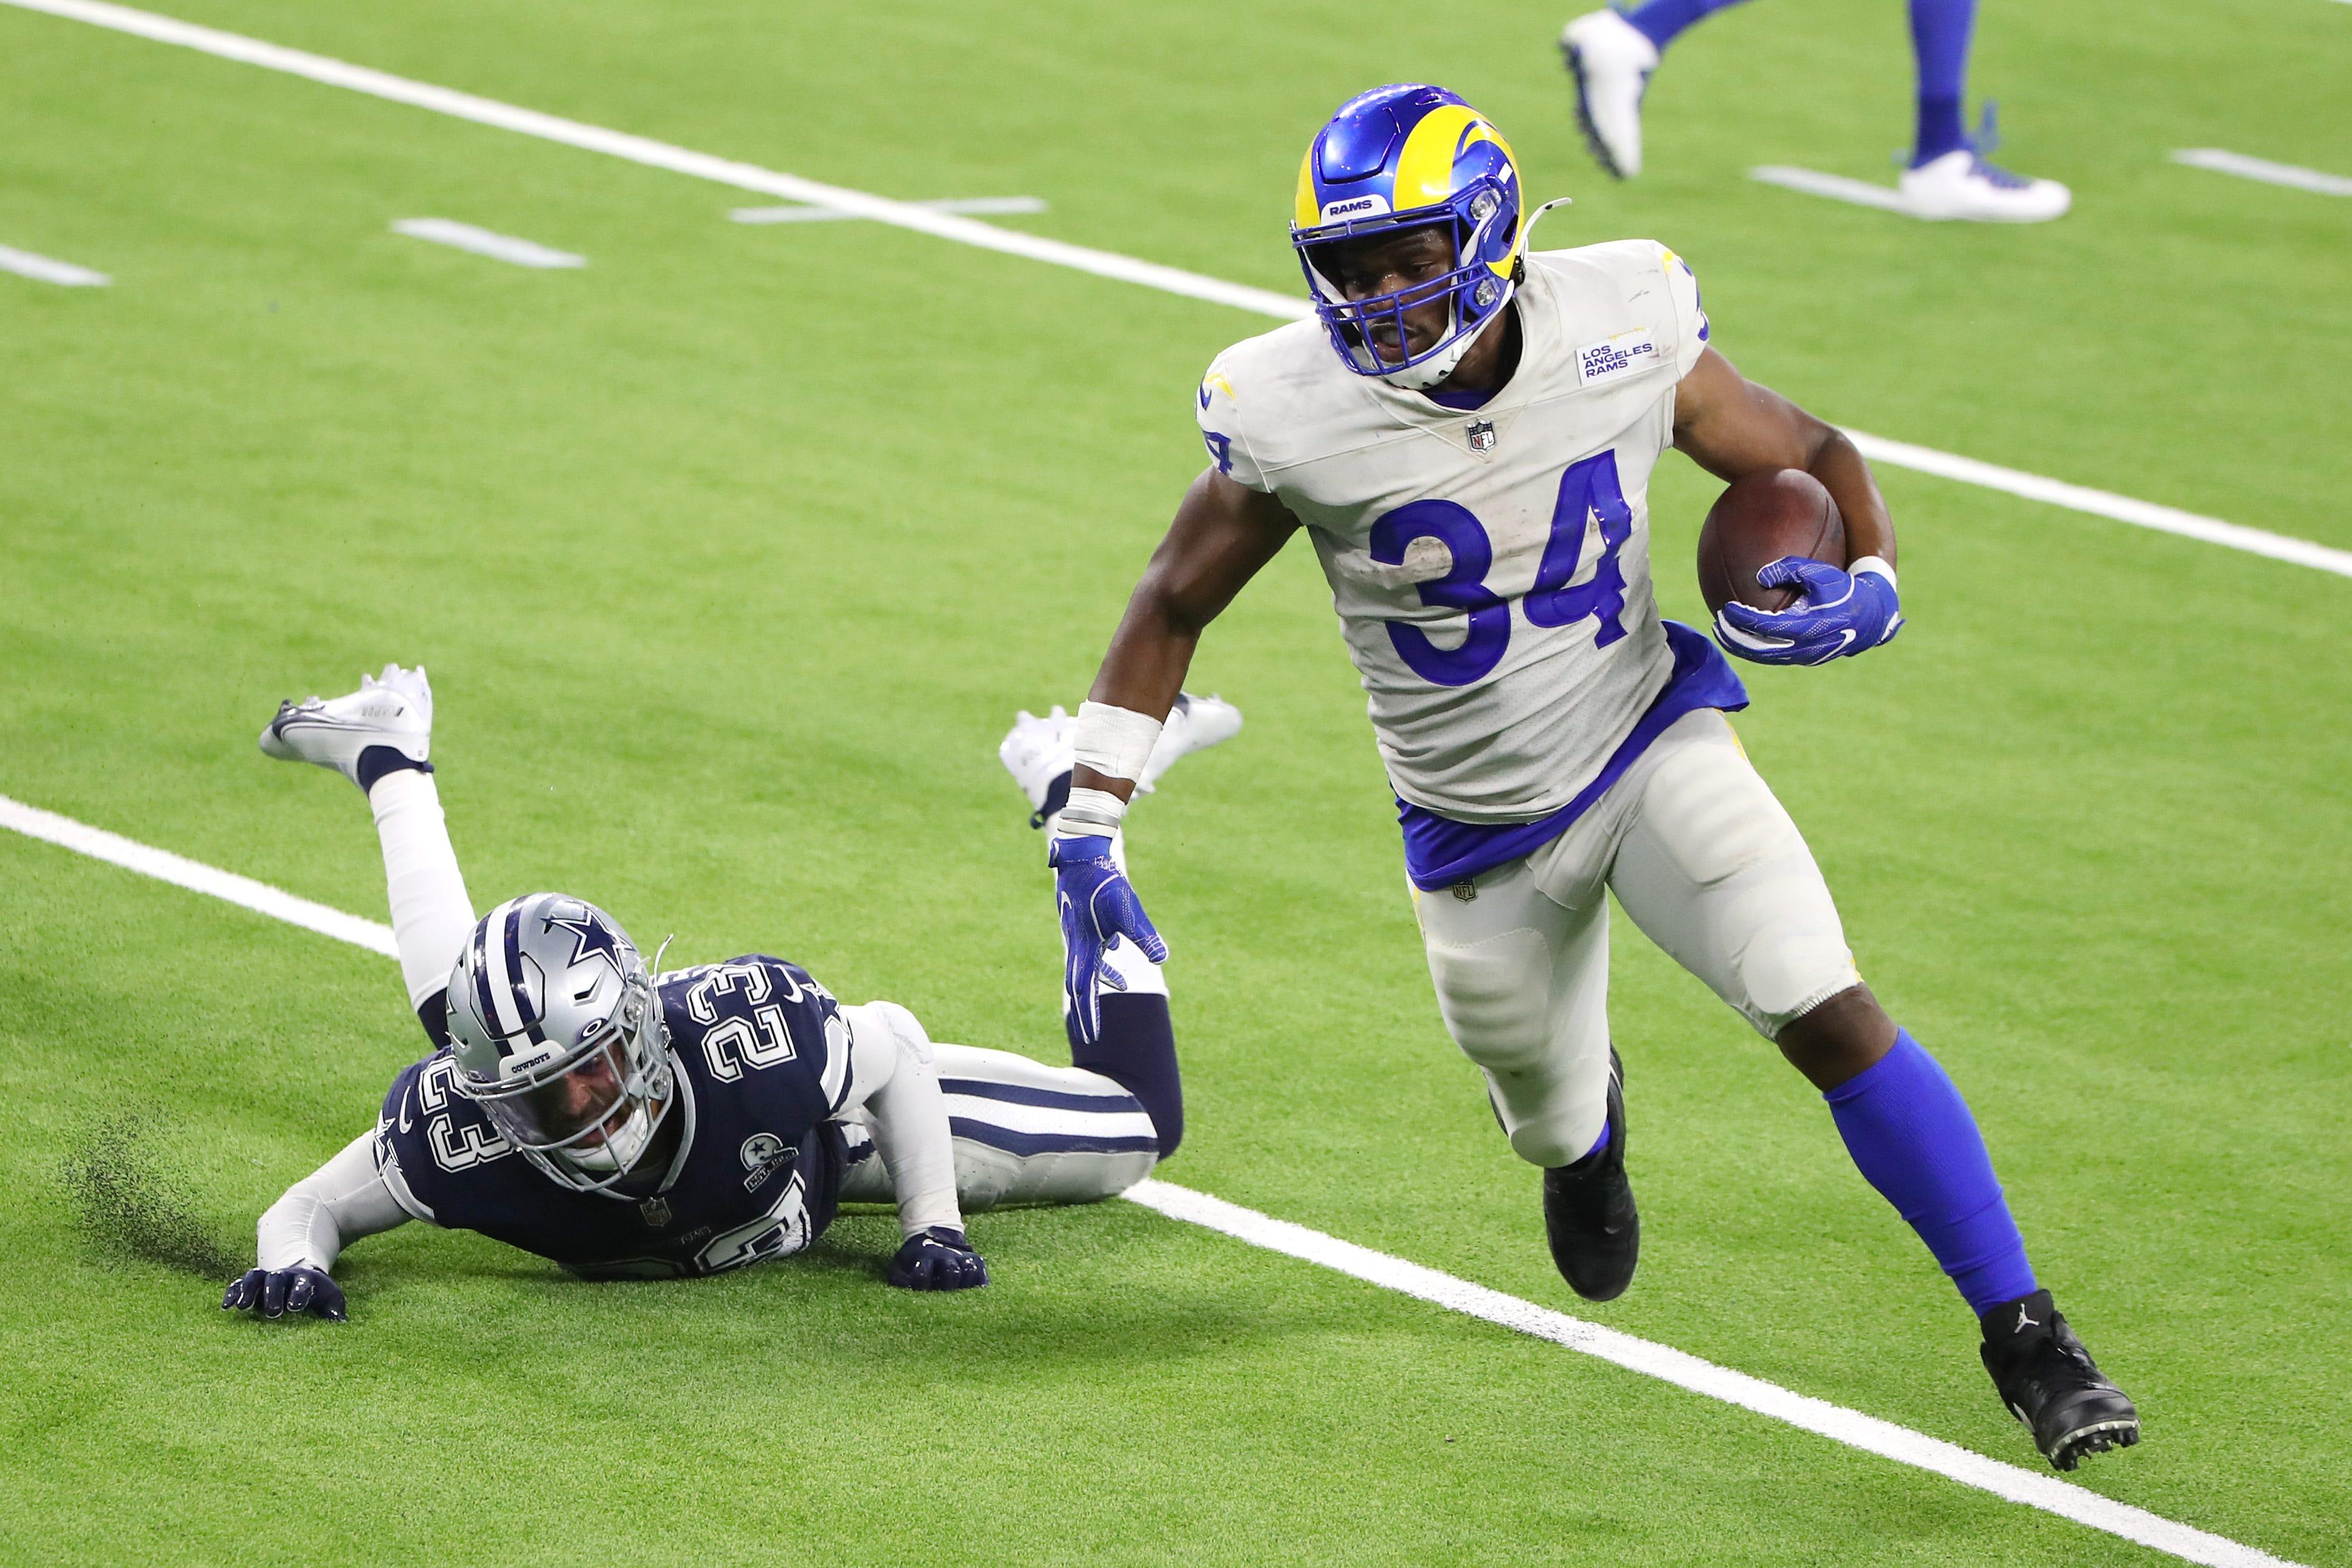 Cowboys stumble in Mike McCarthy s debut, fall to Rams in SoFi Stadium opener